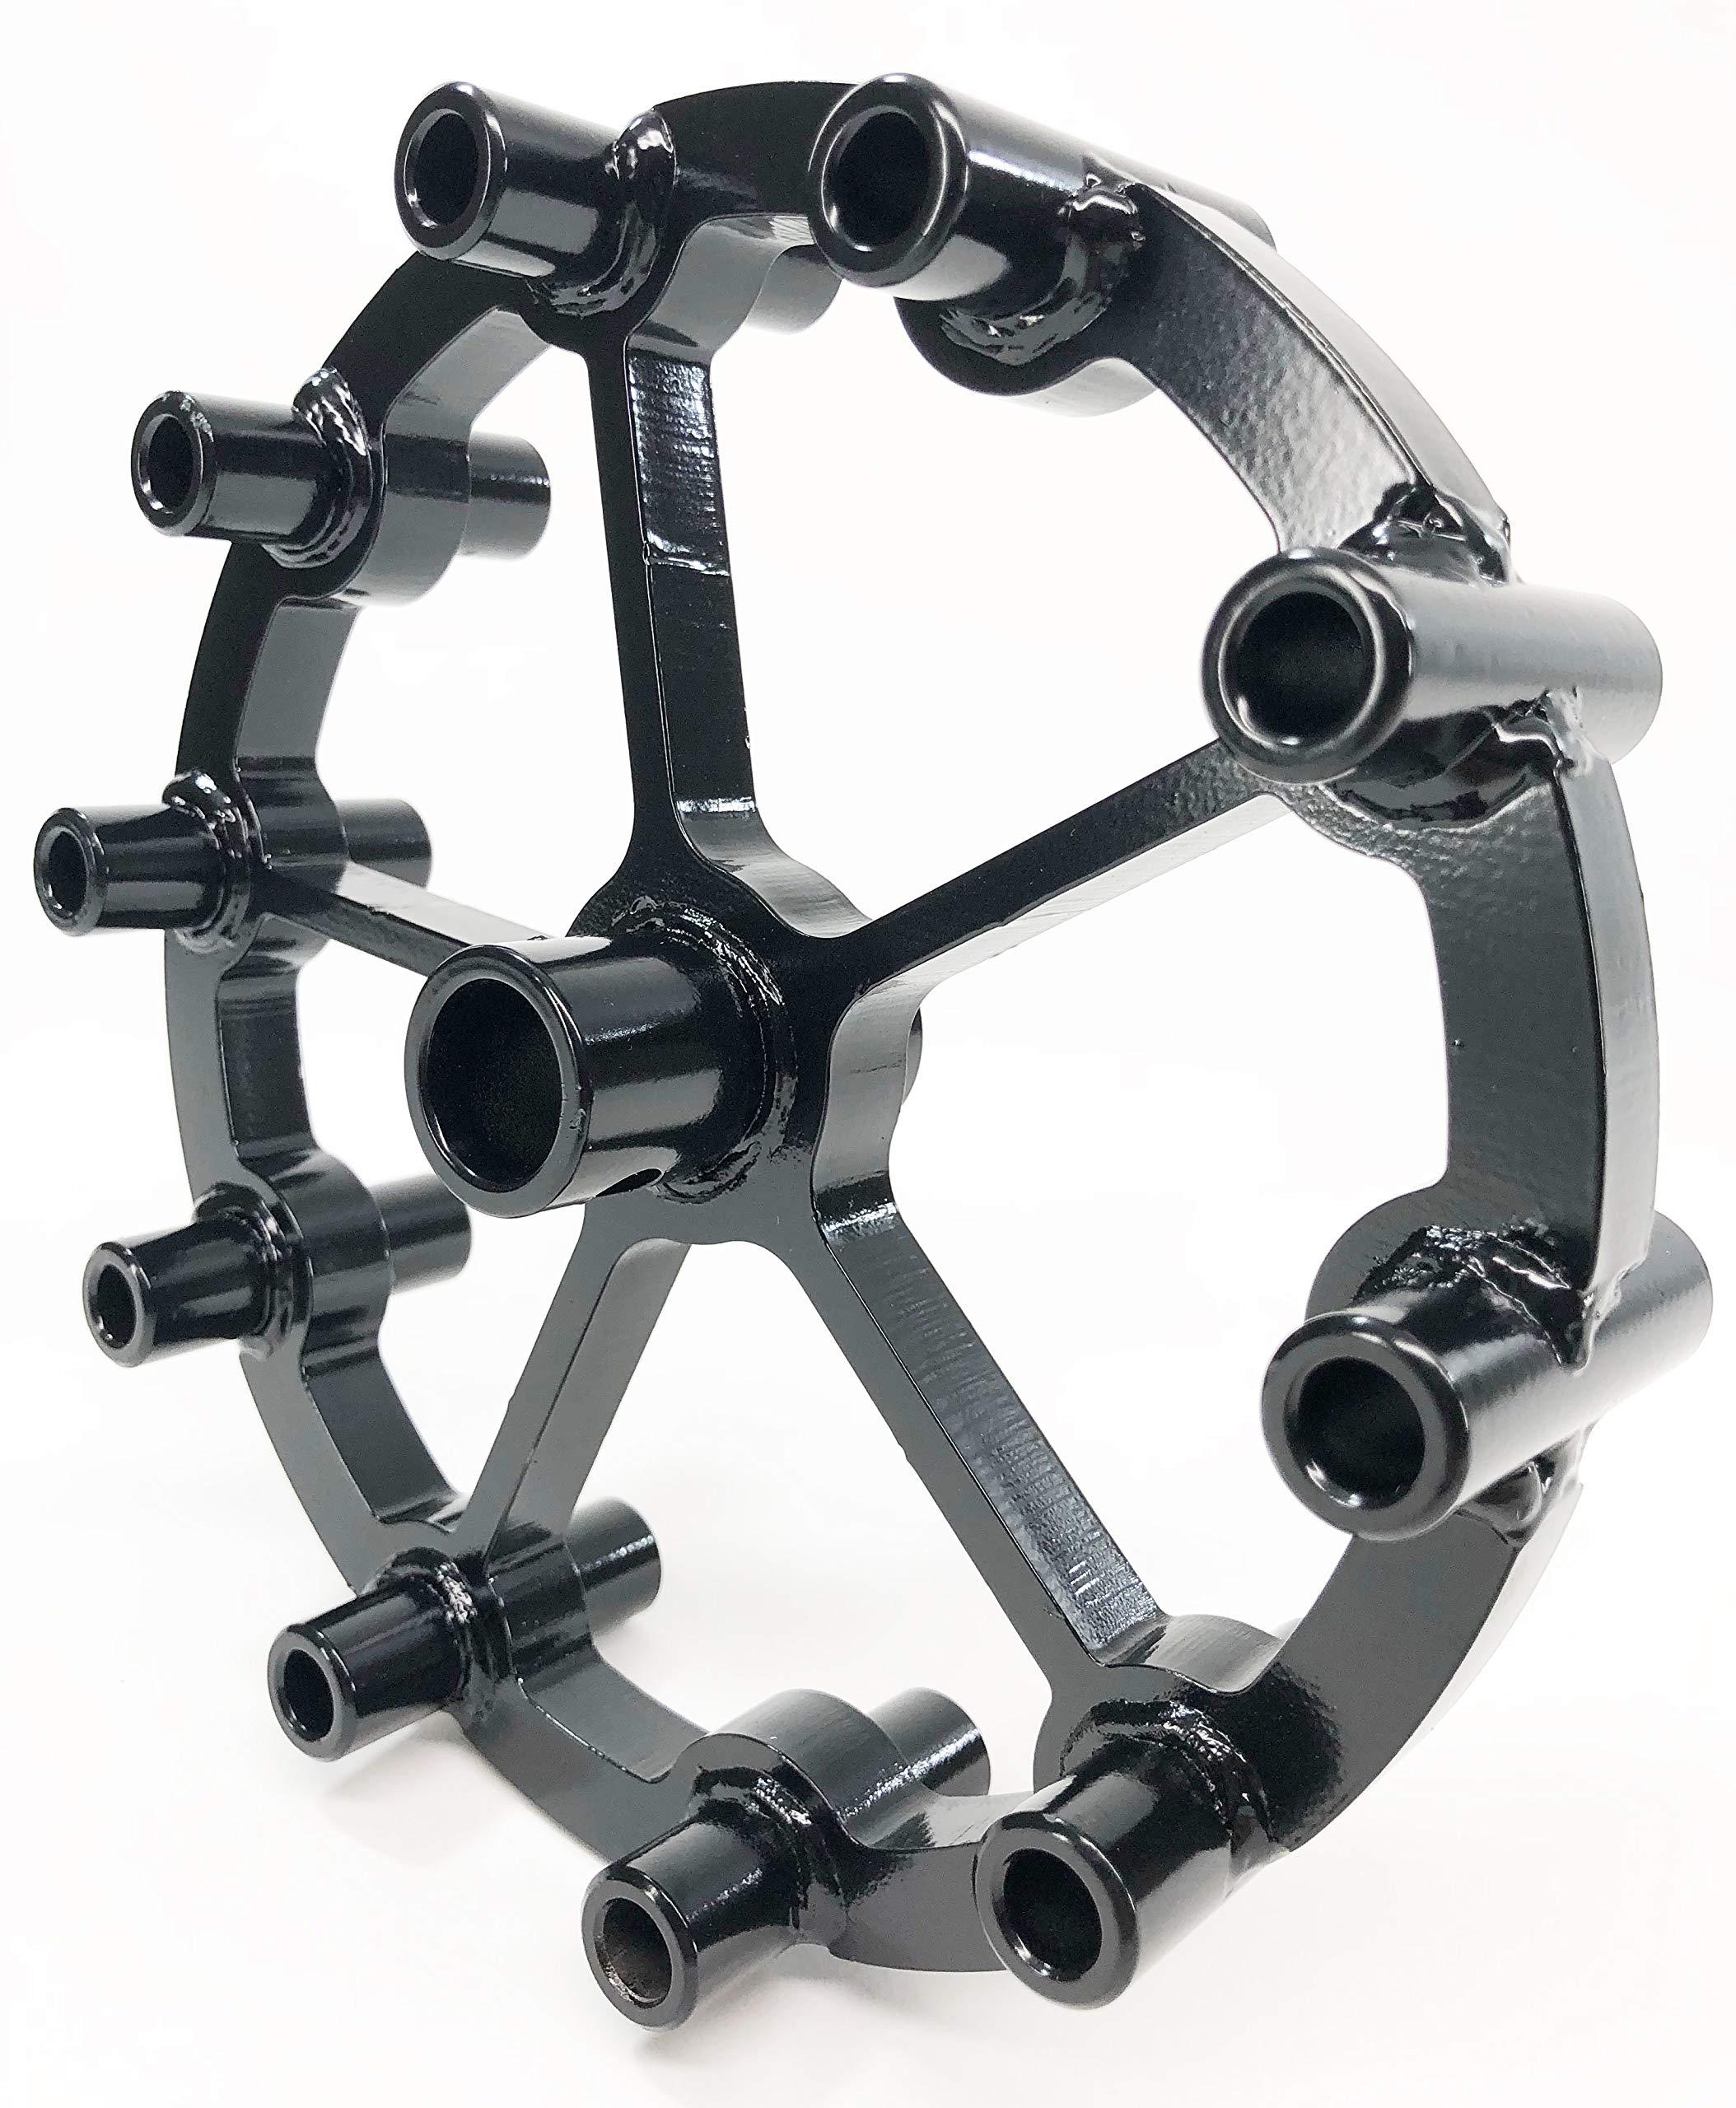 Flip Manufacturing Track Drive Wheel Cog Fits MTD Yardman Snow Blower Thrower 631-0002 631-0032A by Flip Manufacturing